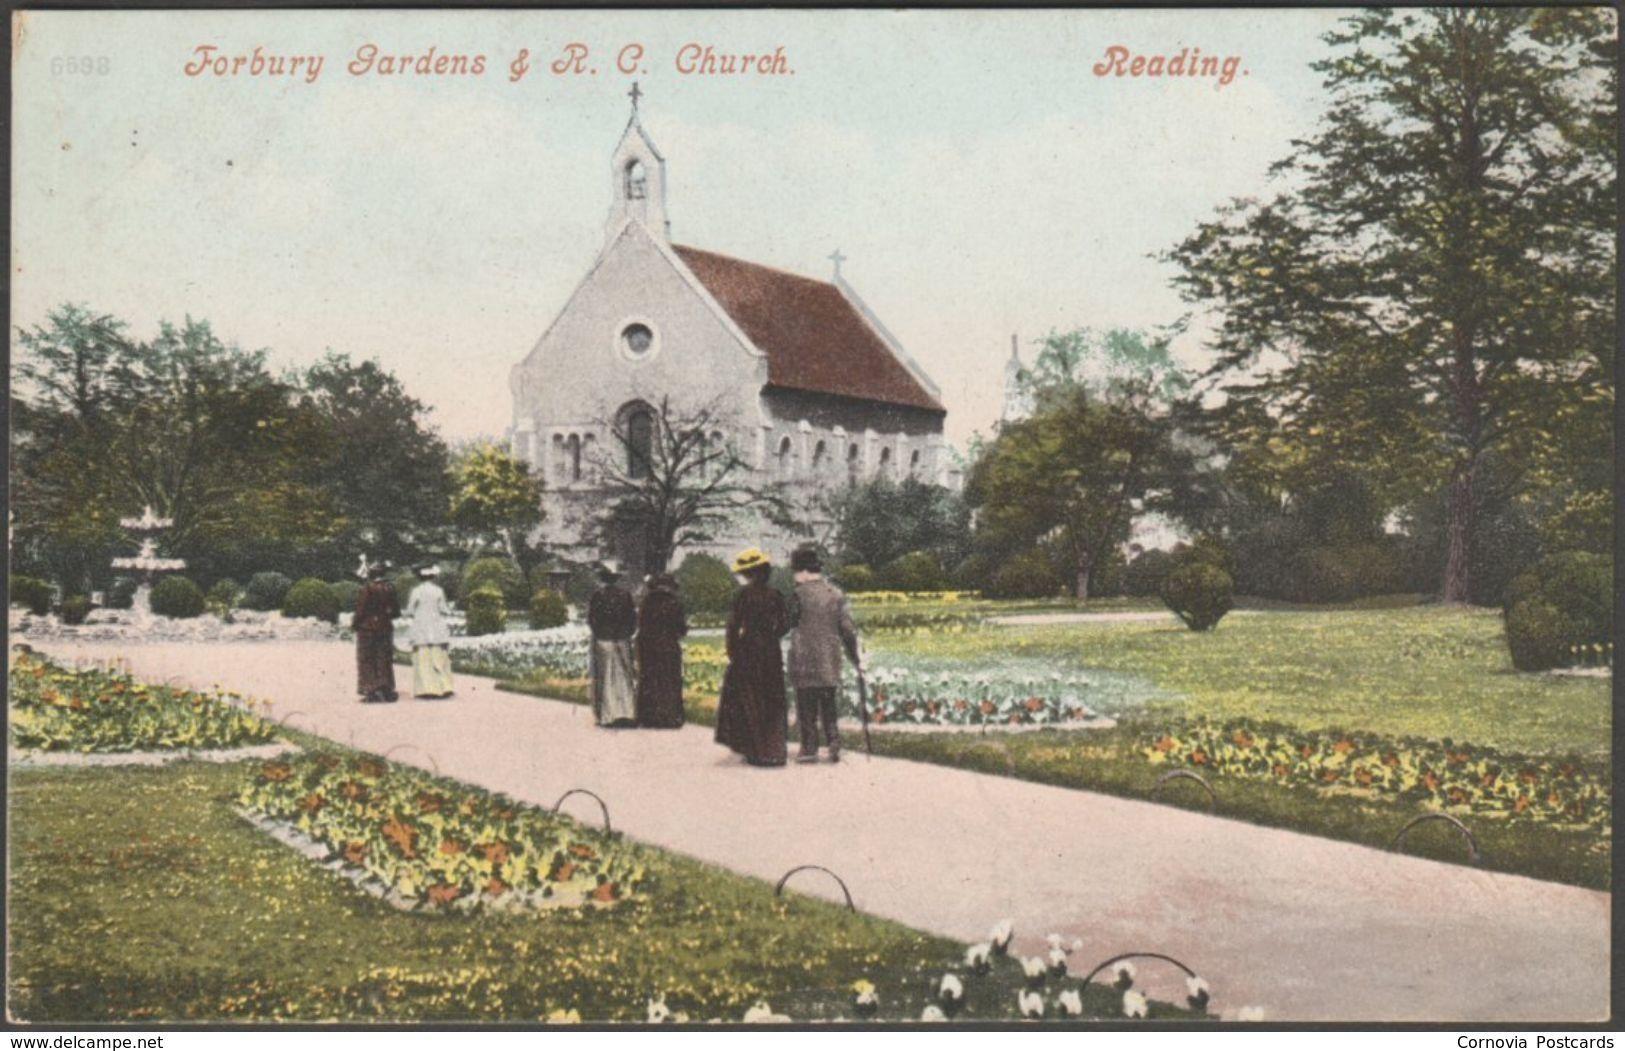 Forbury Gardens & Roman Catholic Church, Reading